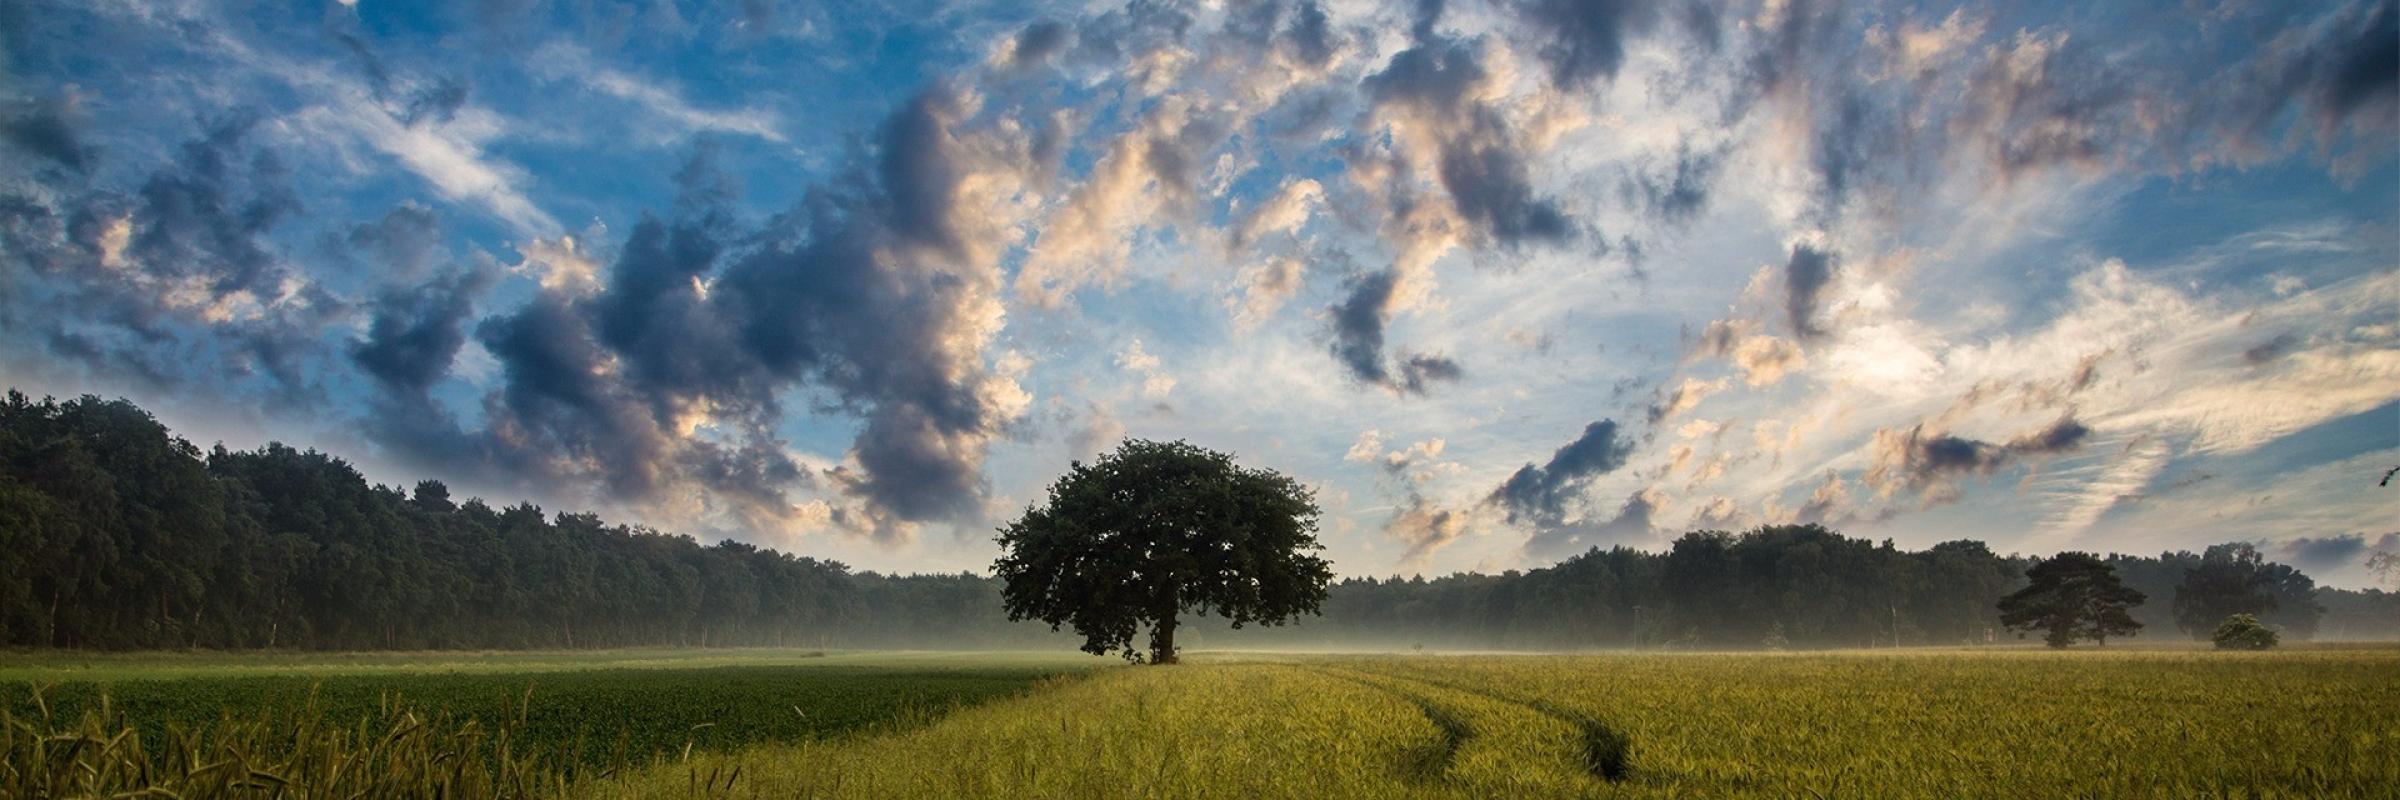 tree-247122